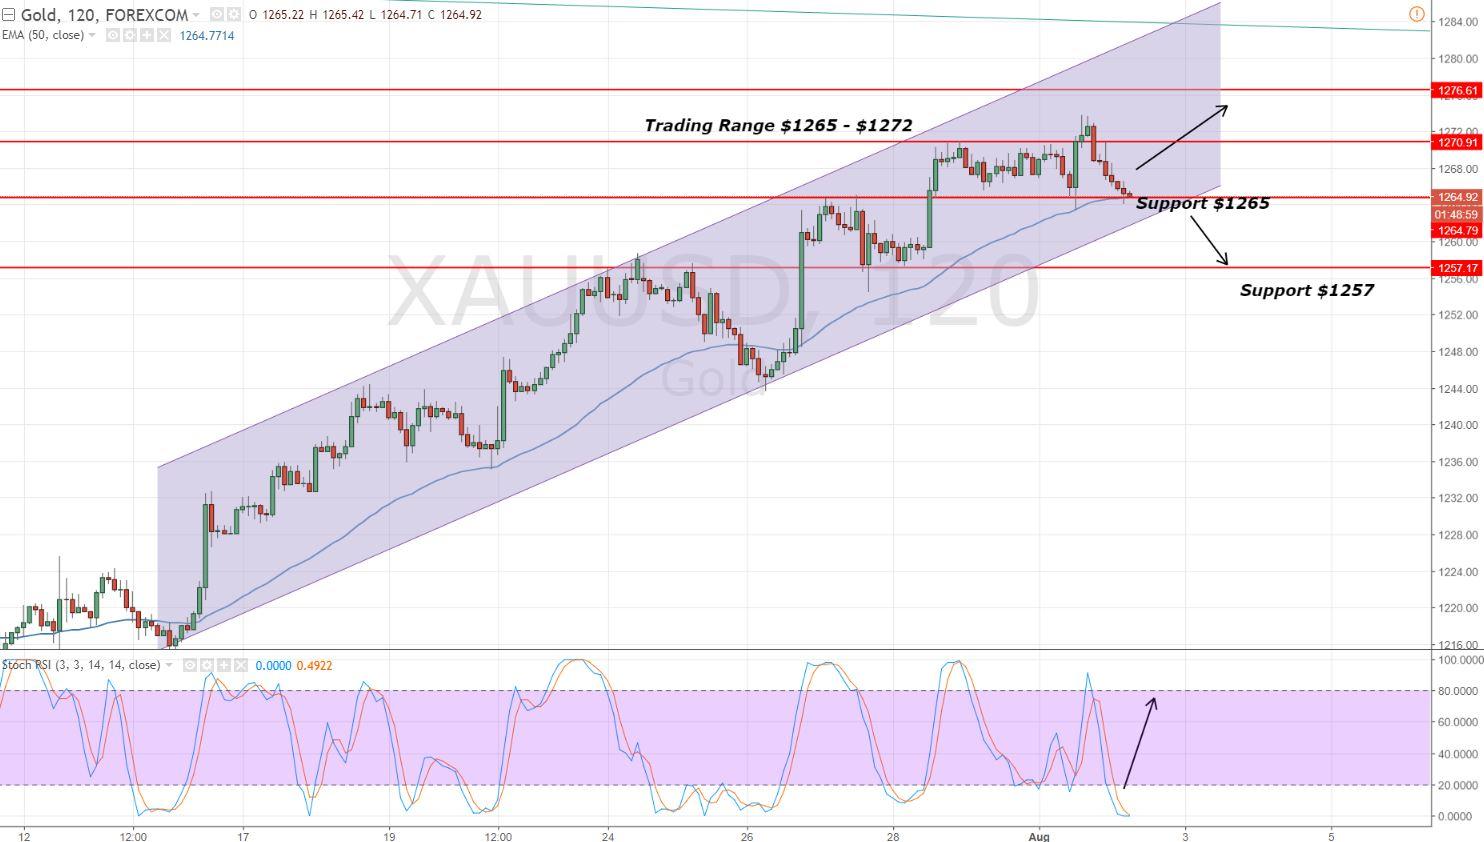 Gold - 2 Hour Chart - Sideways Trend